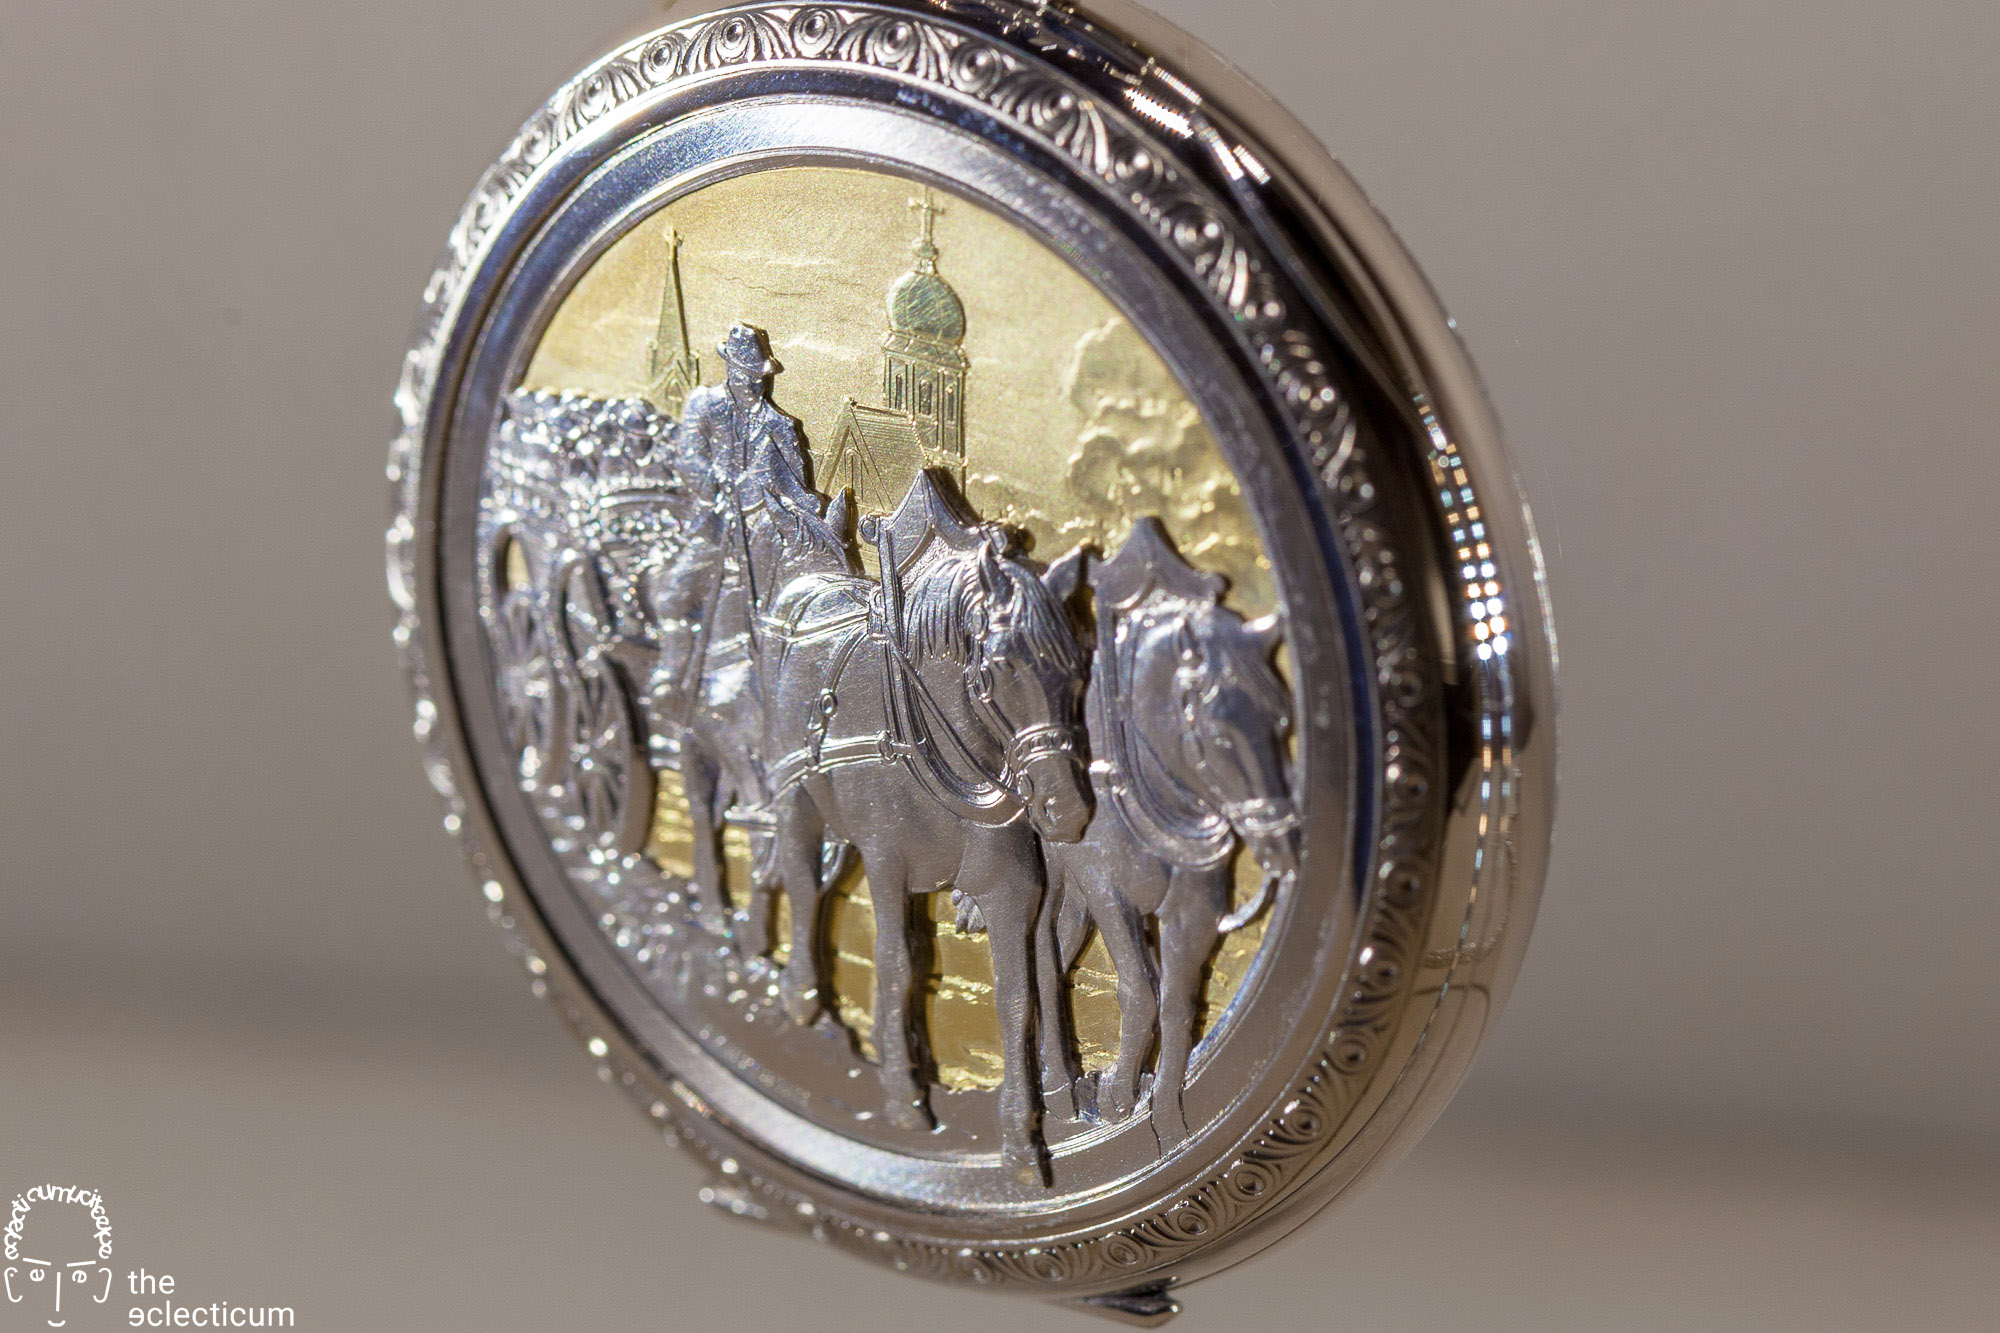 Patek Philippe pocket watch engraved